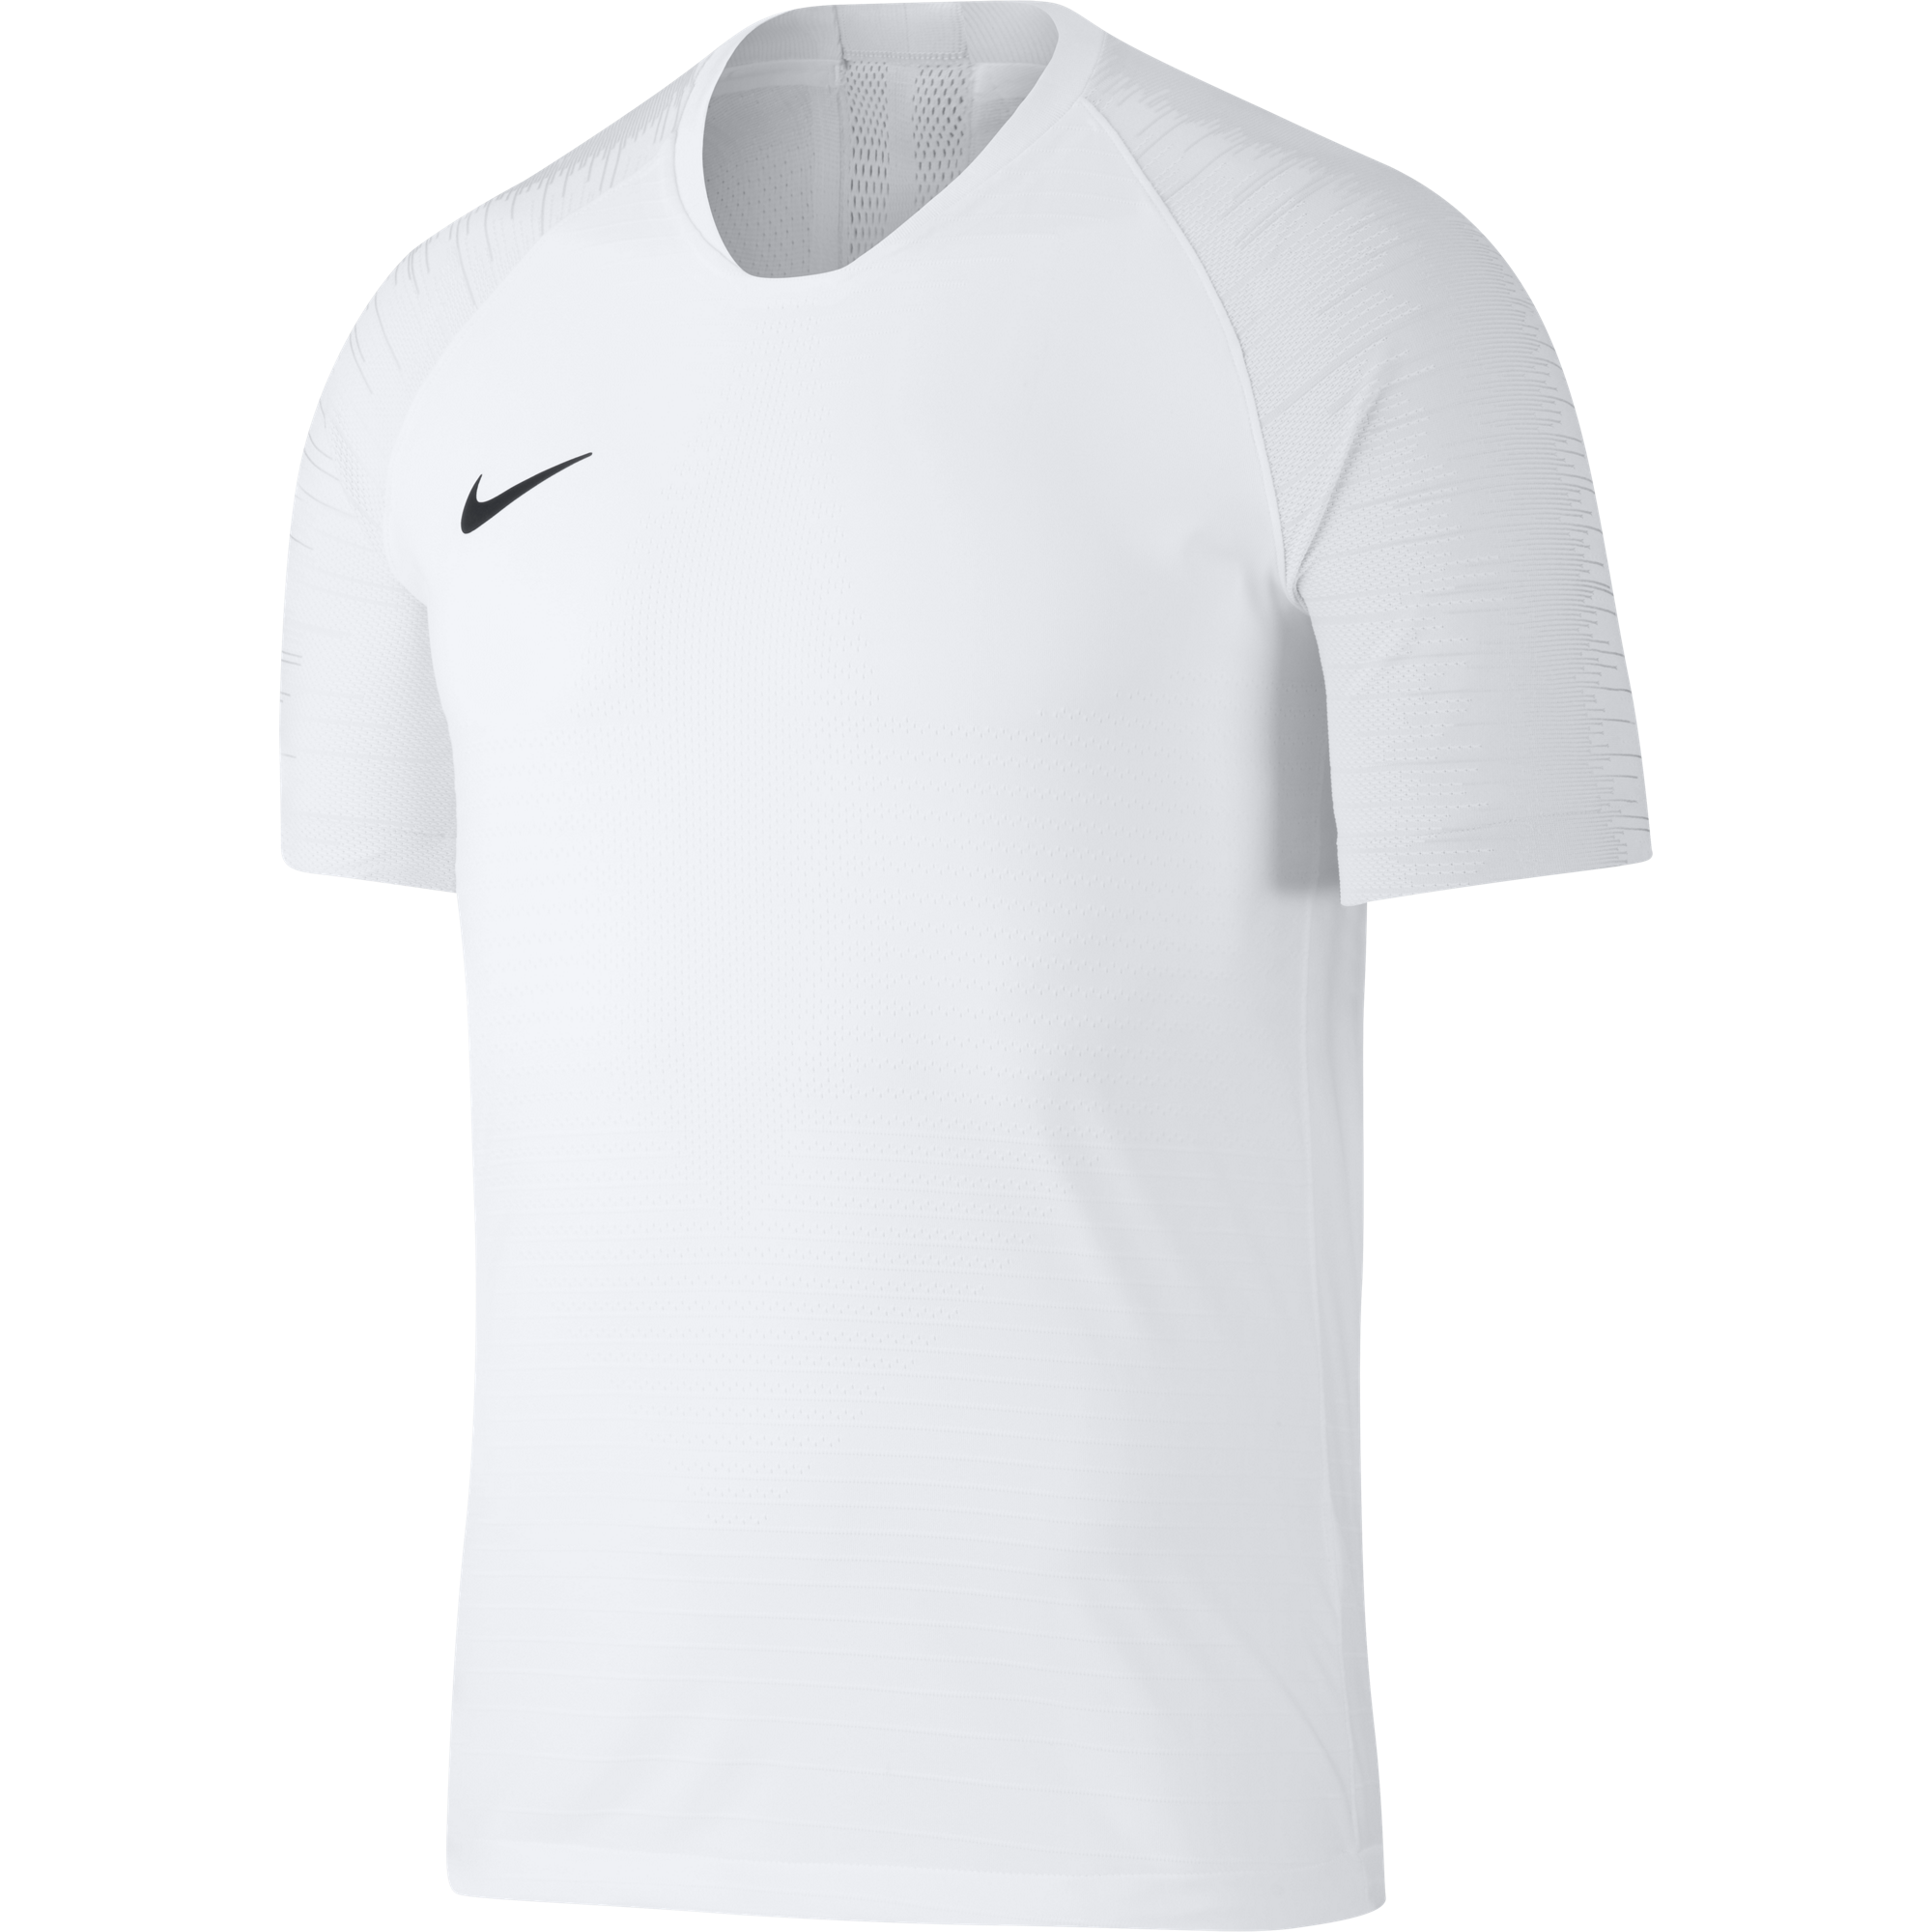 Nike Vapor knit jersey White